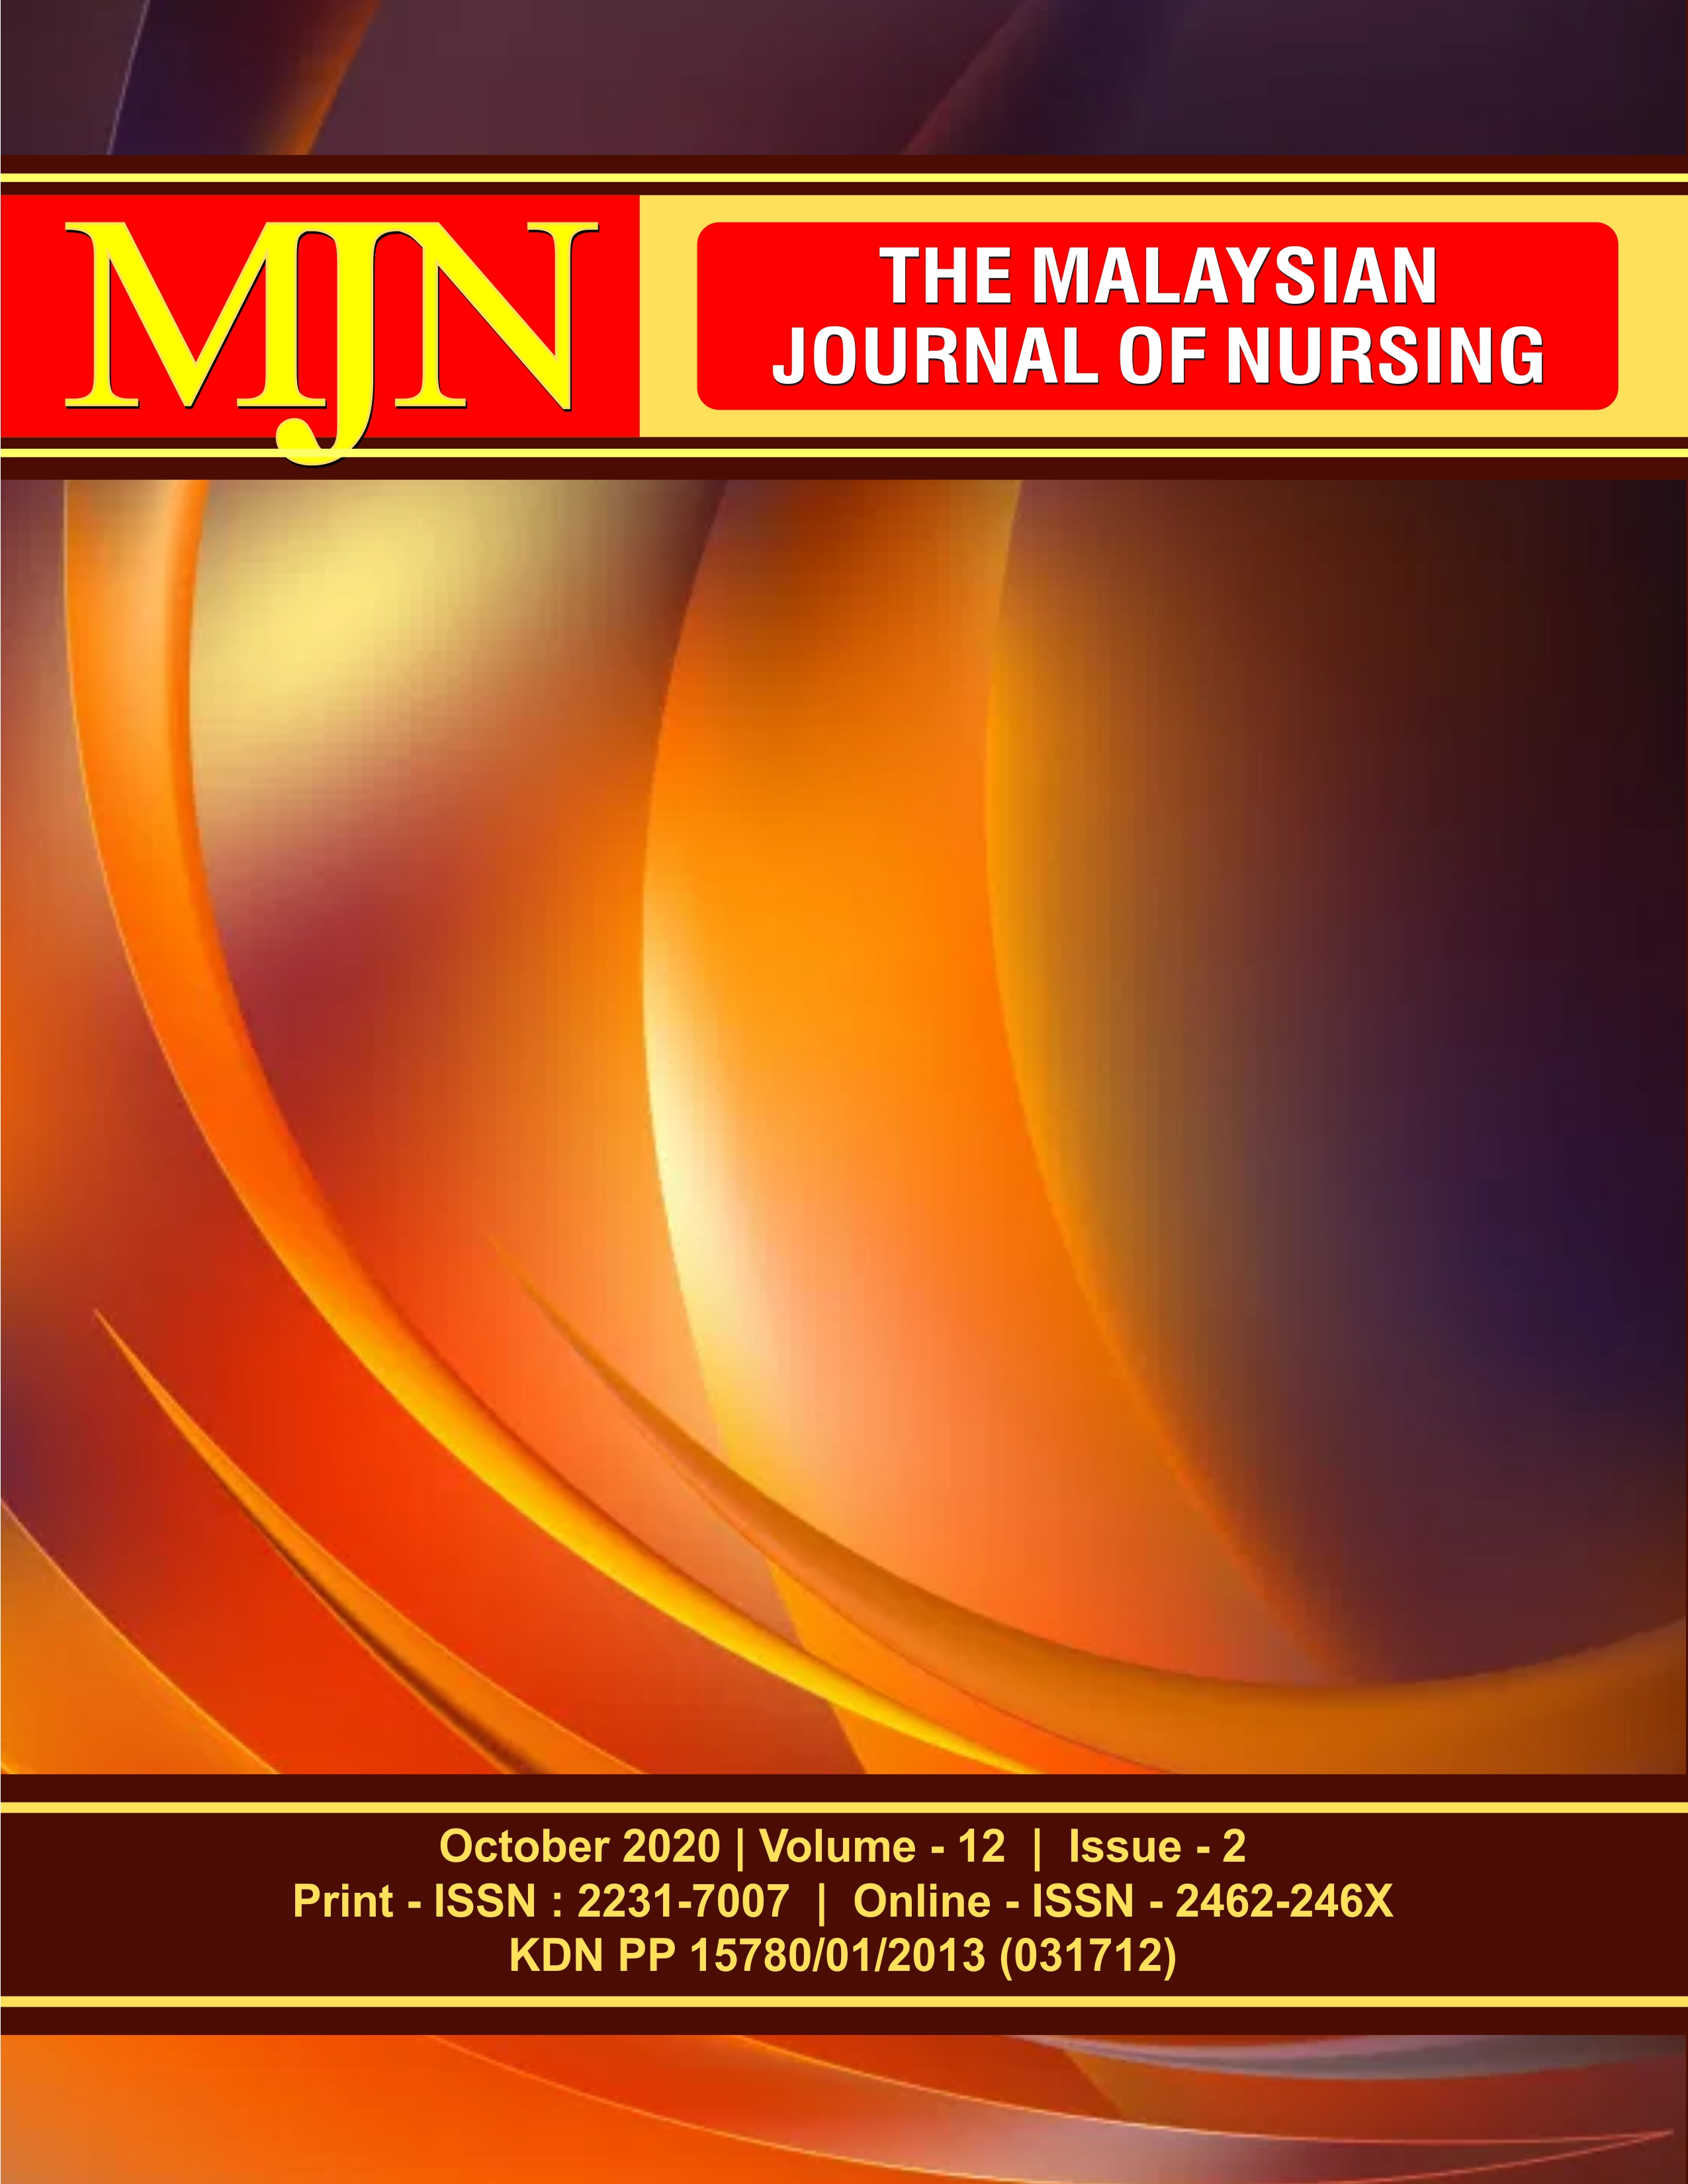 View Vol. 12 No. 2 (2020): The Malaysian Journal of Nursing